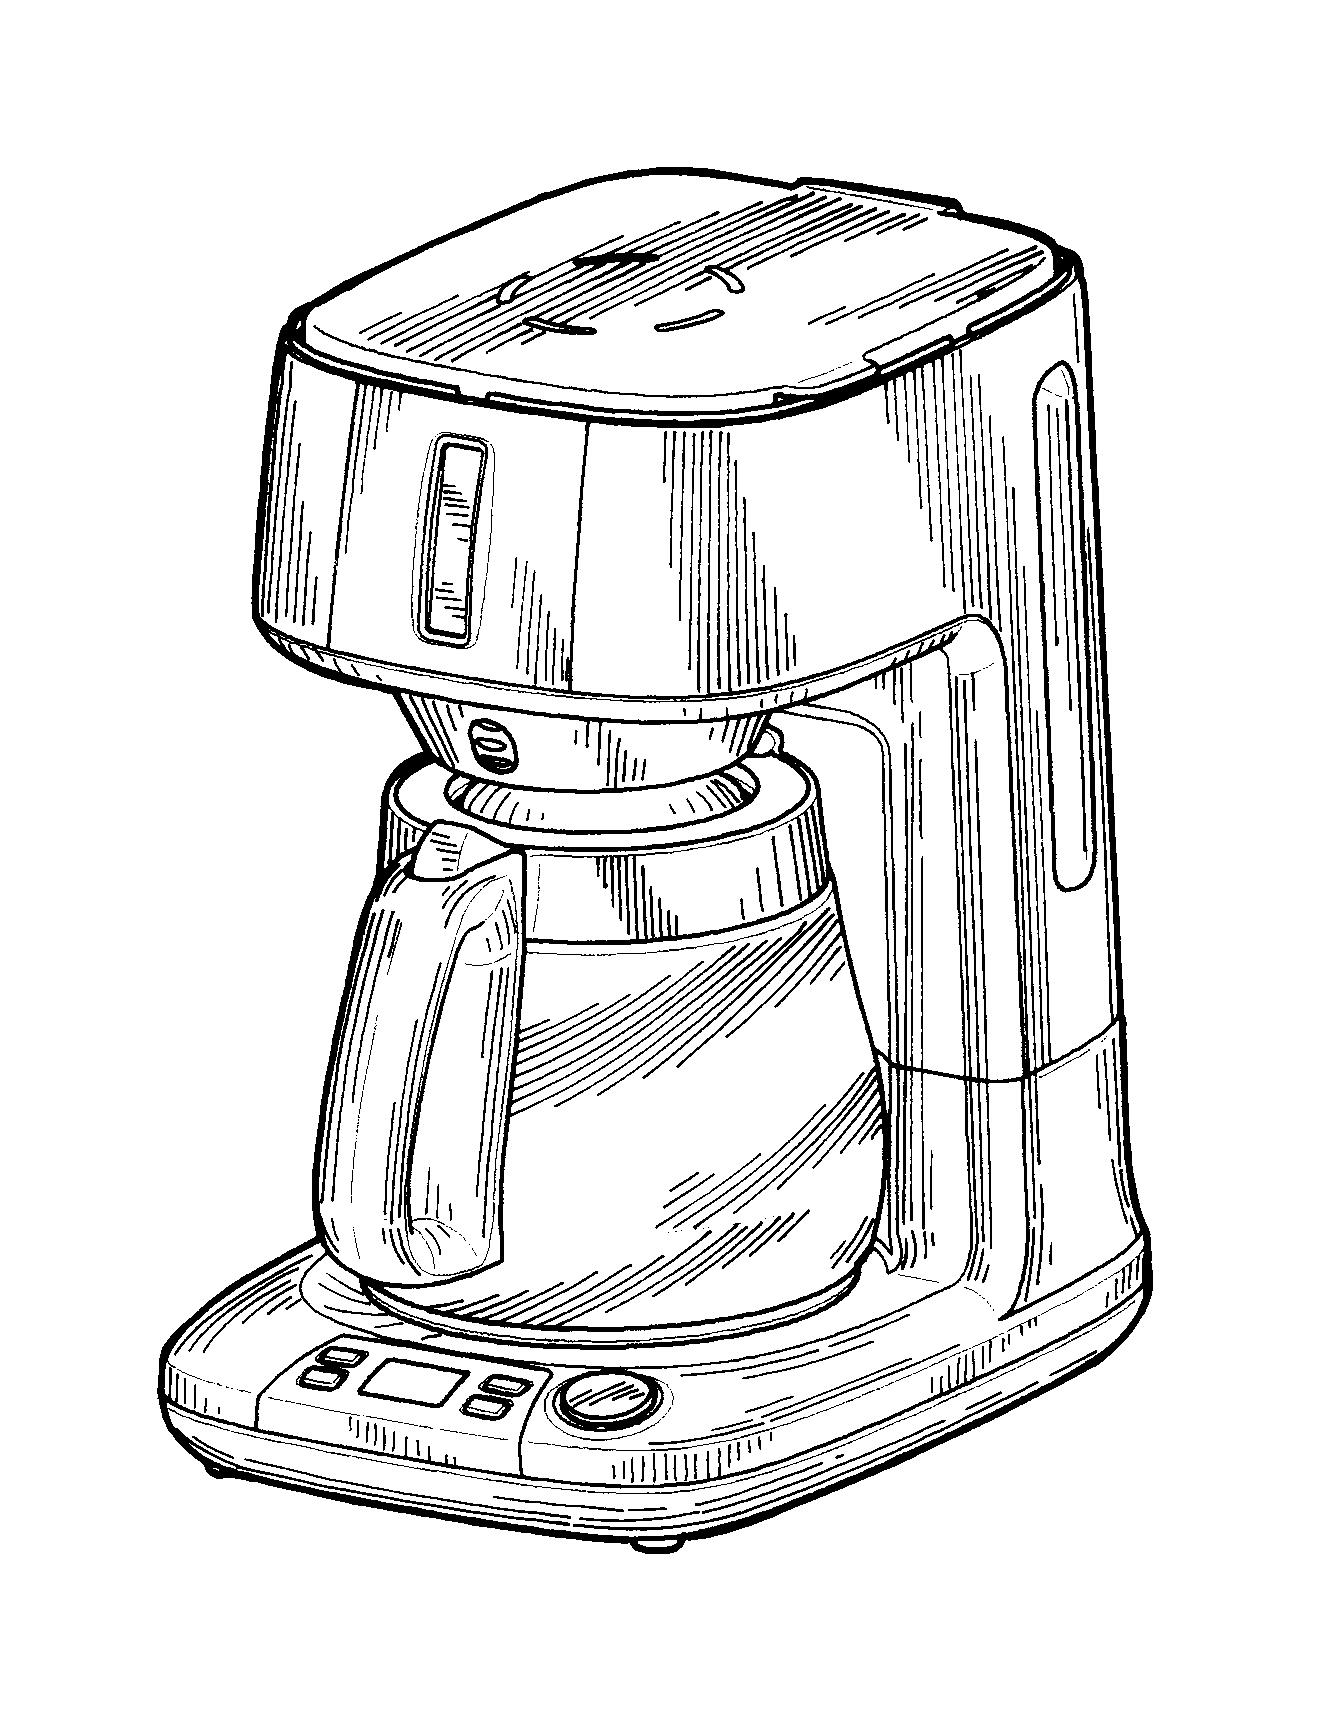 Coffee Maker Drawing At Getdrawings